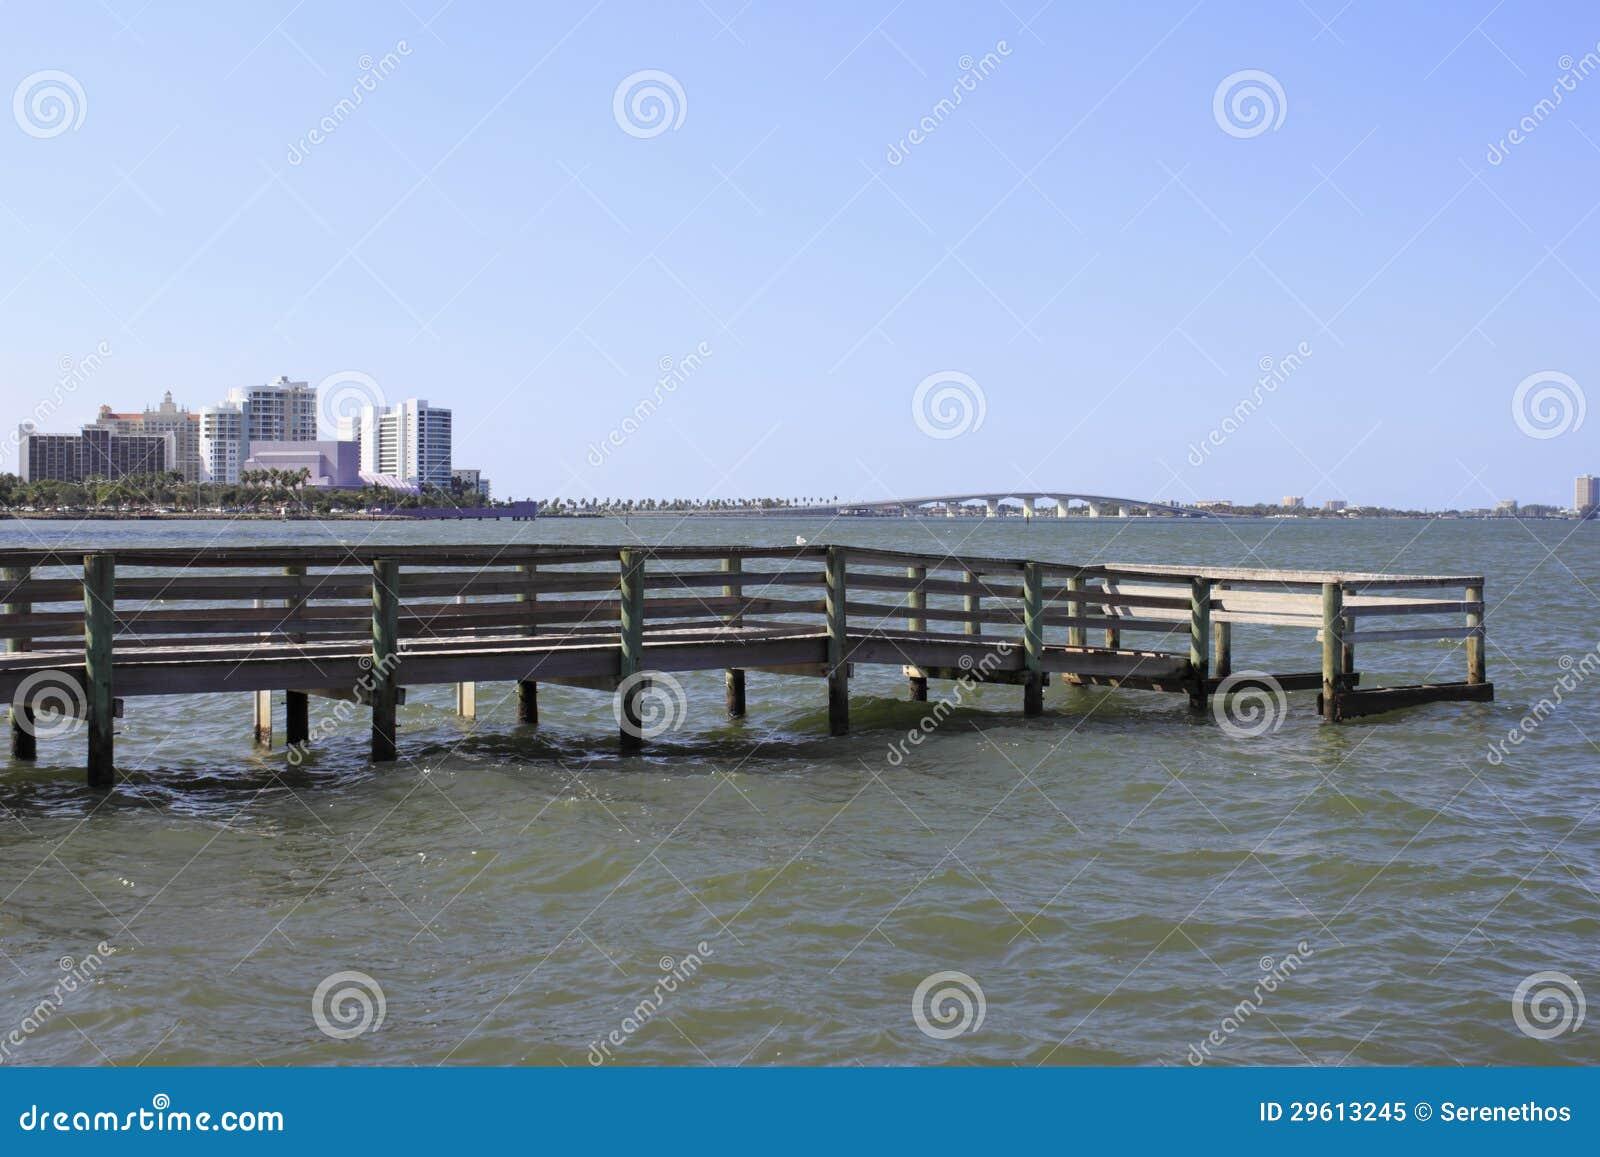 Pier north of sarasota royalty free stock photo image for Sarasota fishing pier